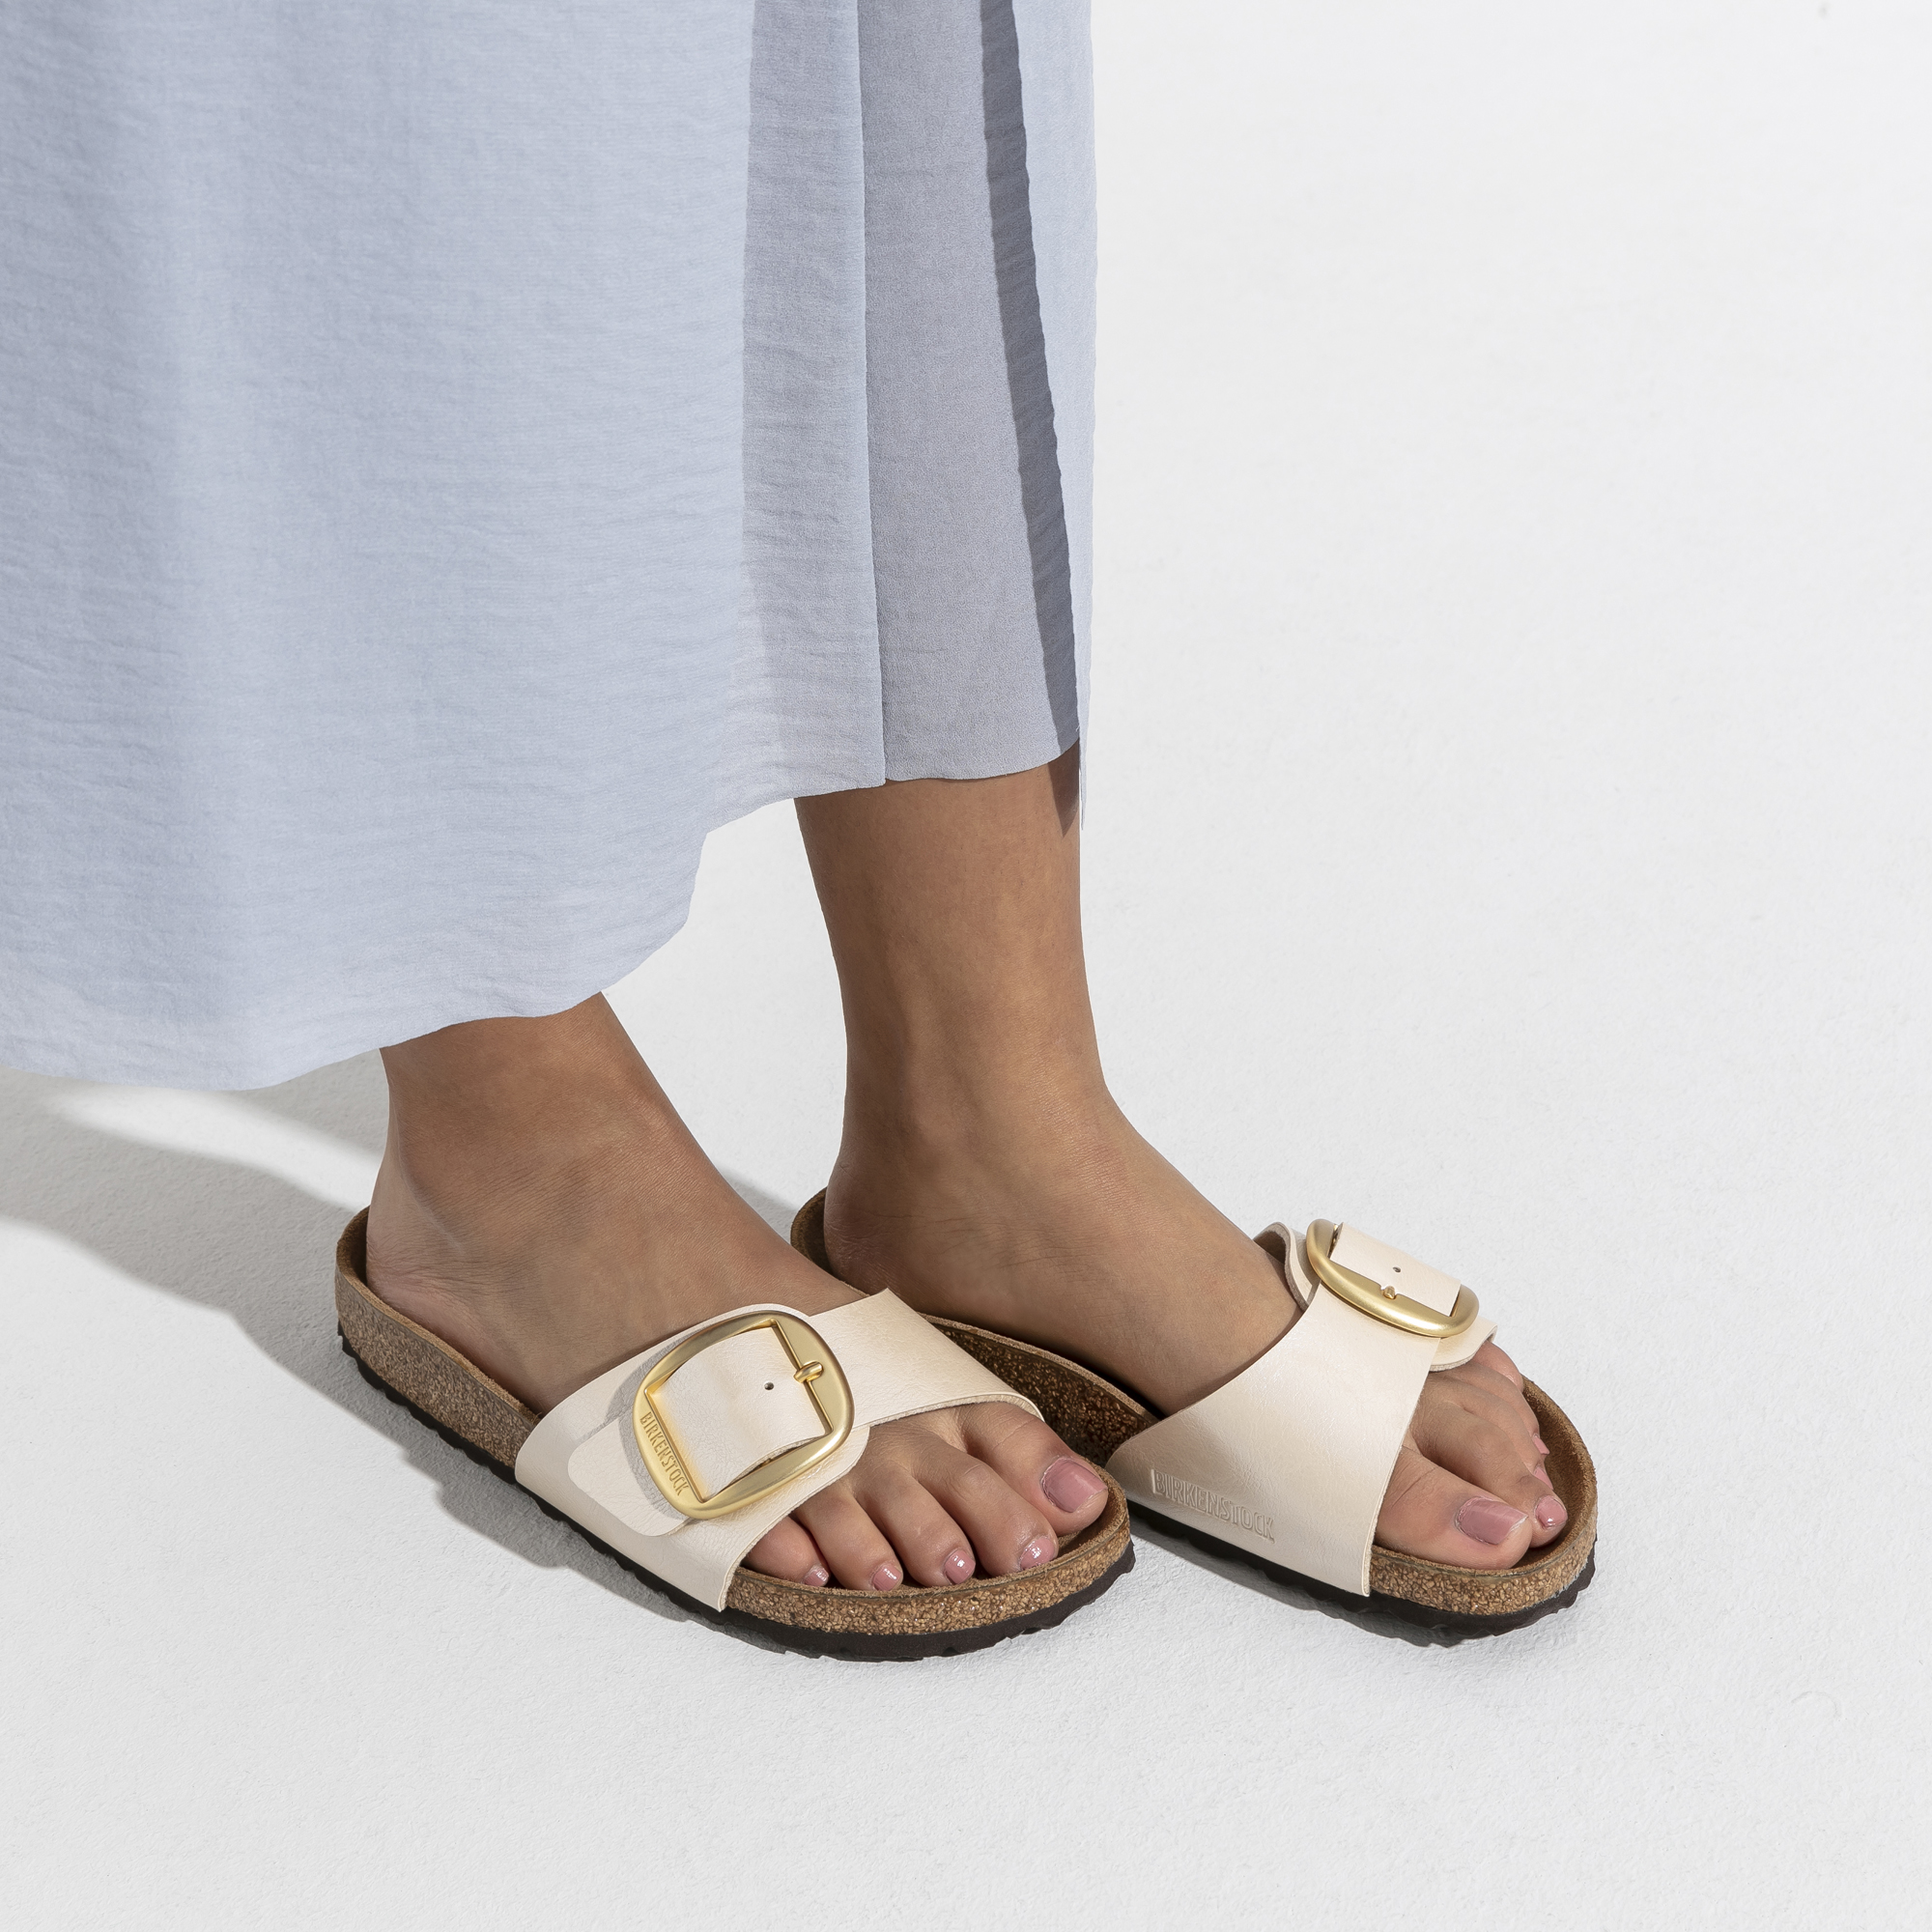 Pantolette Birkenstock Madrid Big Buckle Graceful Pearl White Narrow Damen